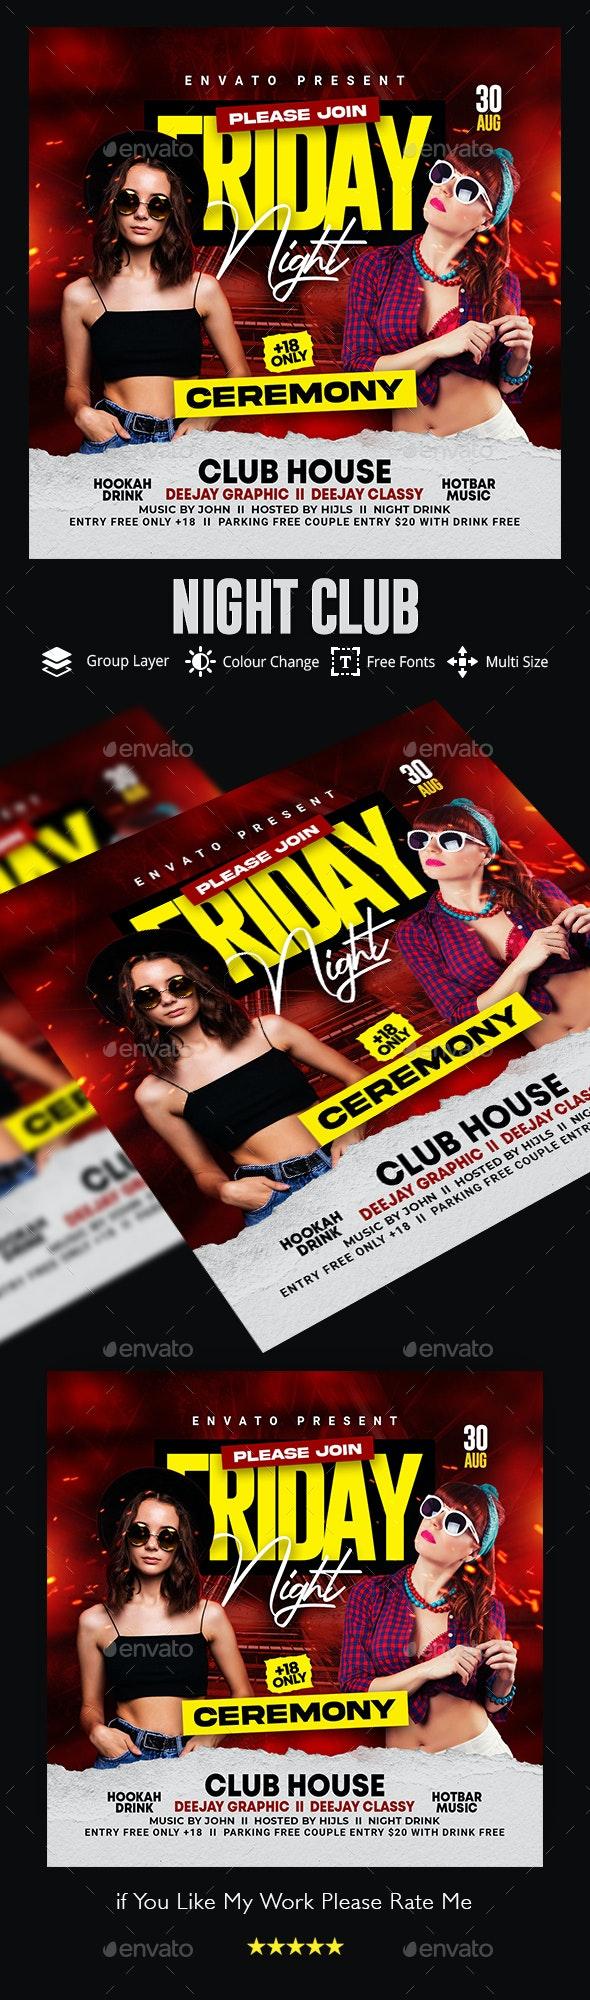 Night Club Flyer - Flyers Print Templates